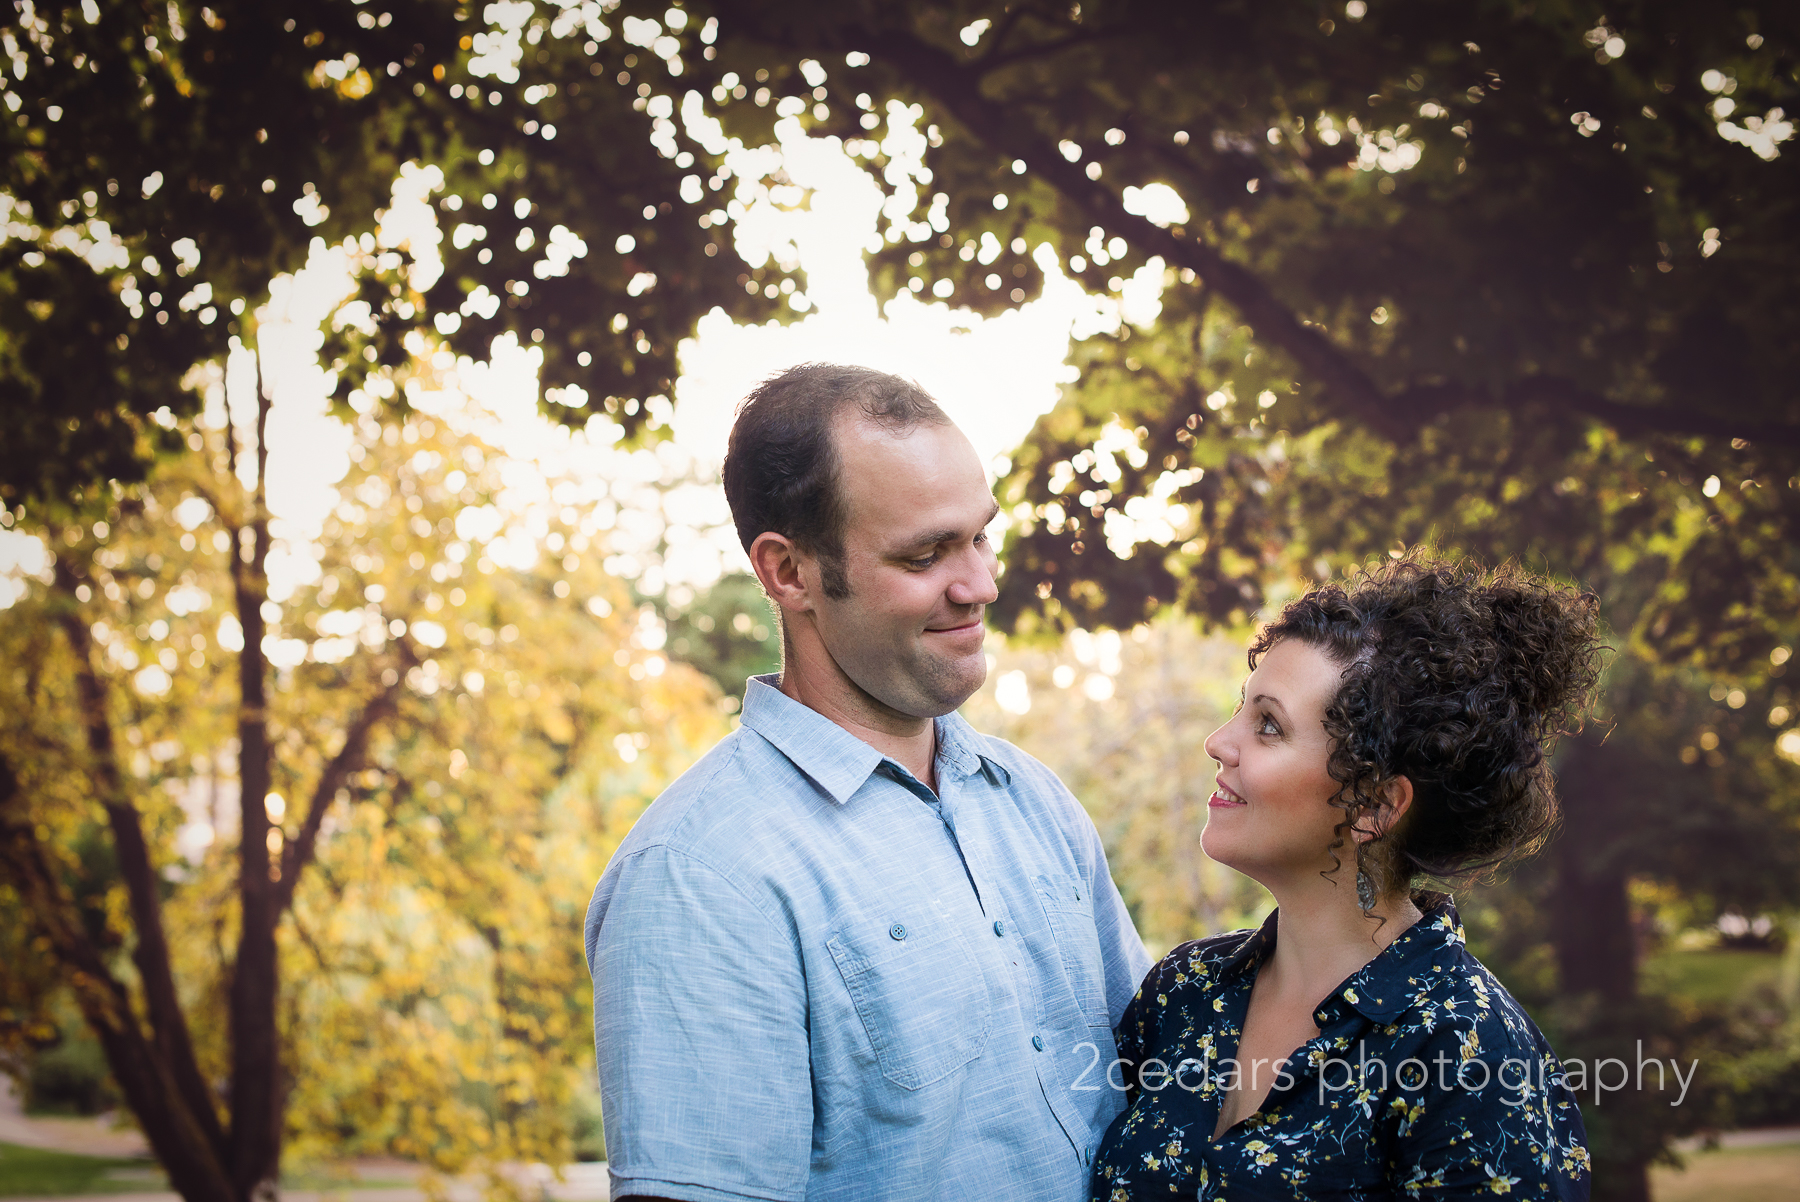 2cedarsphoto-Sullivan-Family-Web--5.jpg